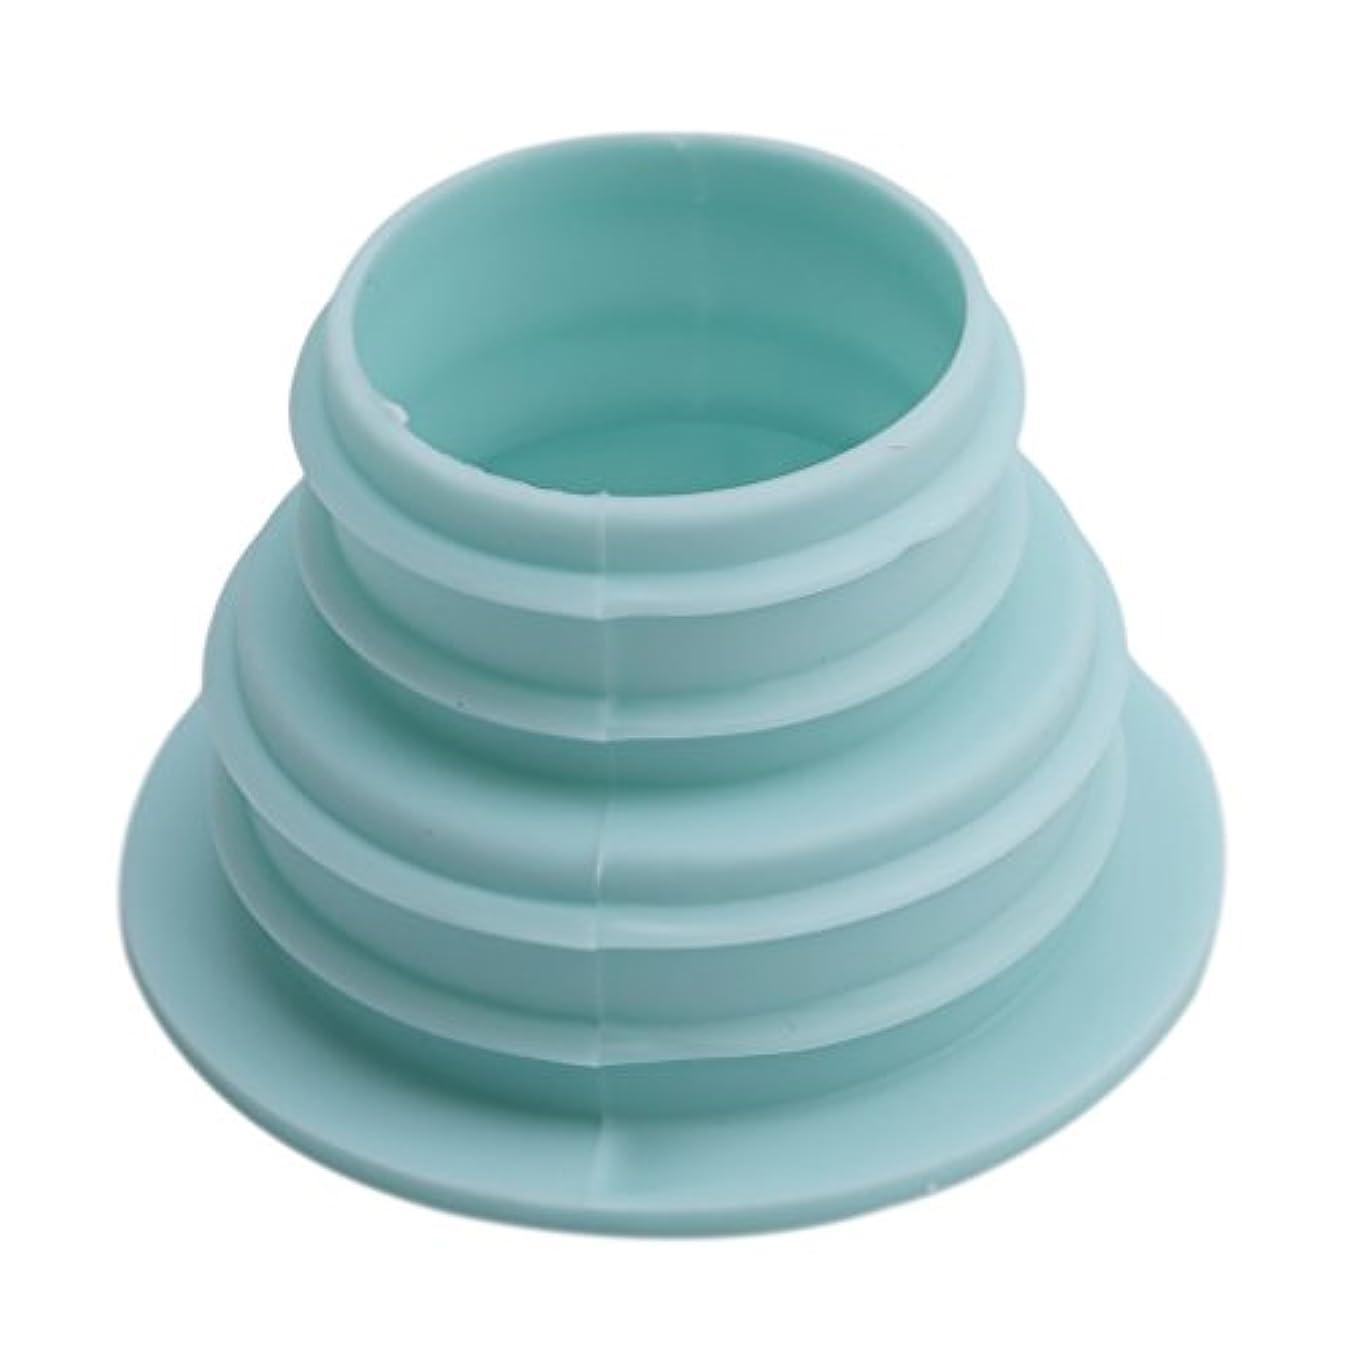 BEE&BLUE 洗濯機ホース用の排水口取り付けパーツ (ライトブルー)